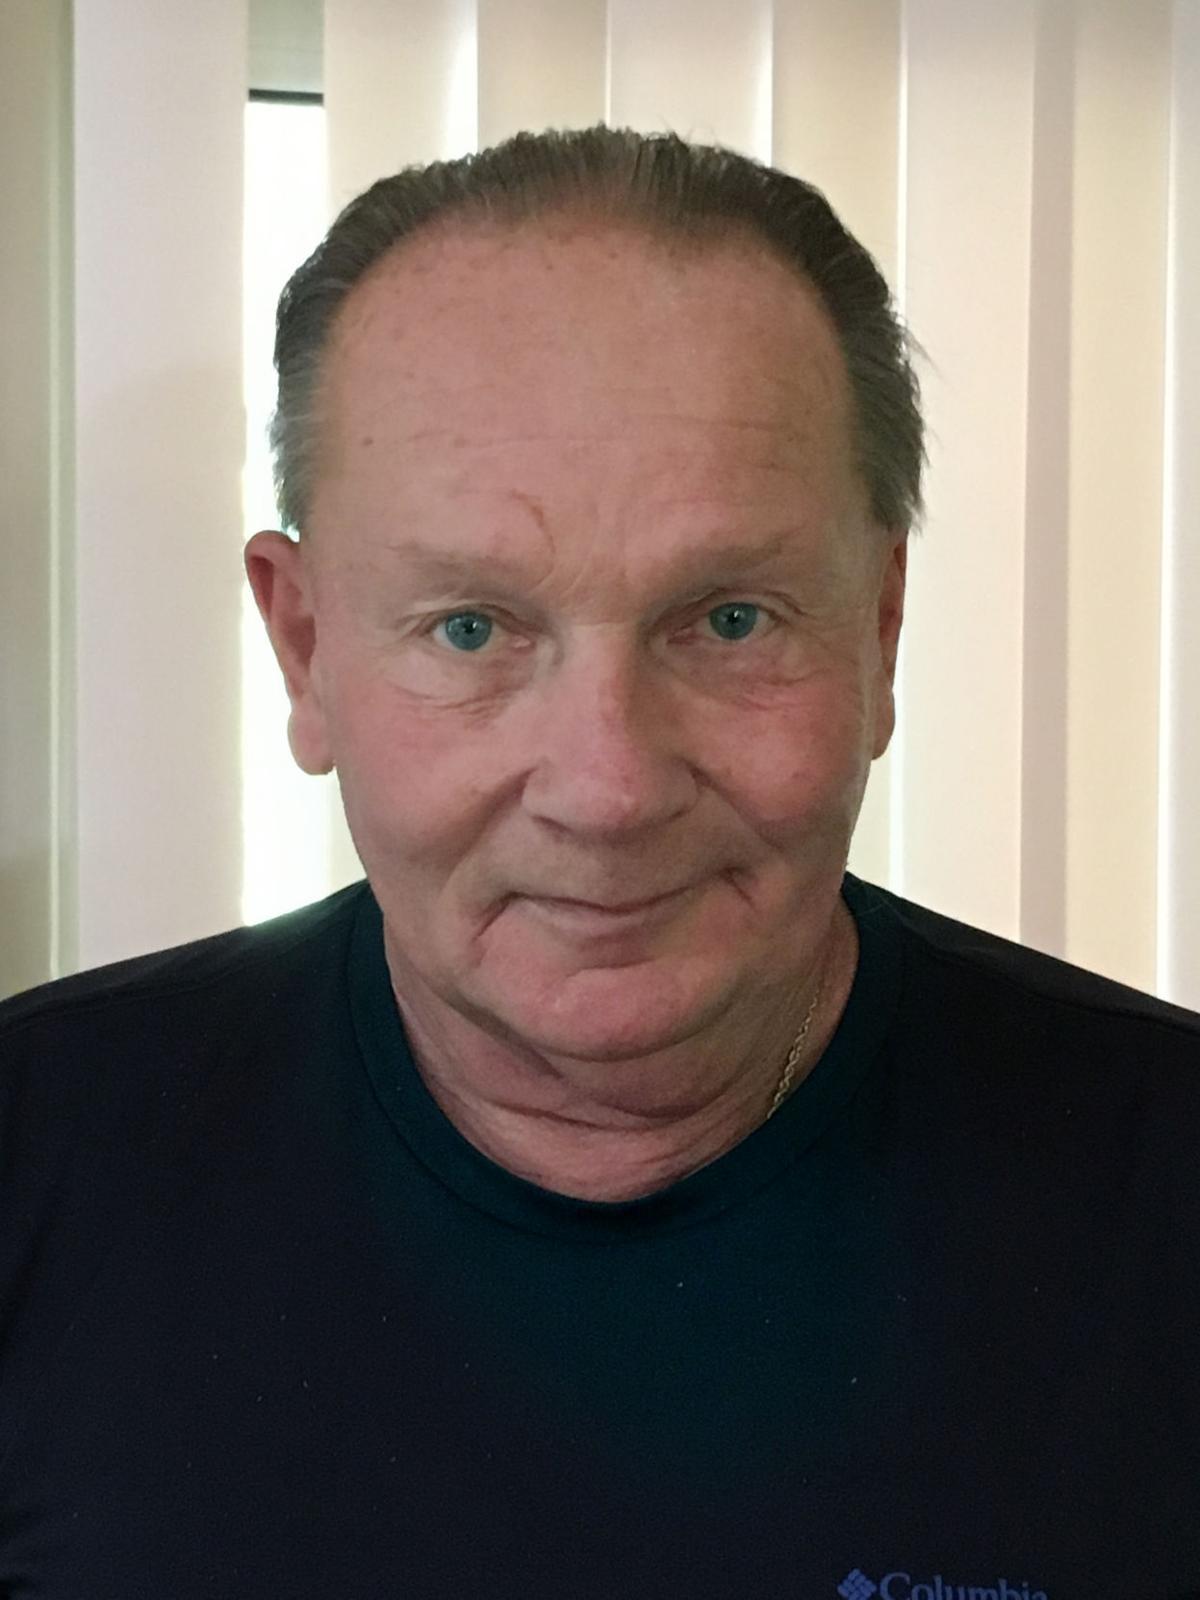 Joe Middendorf